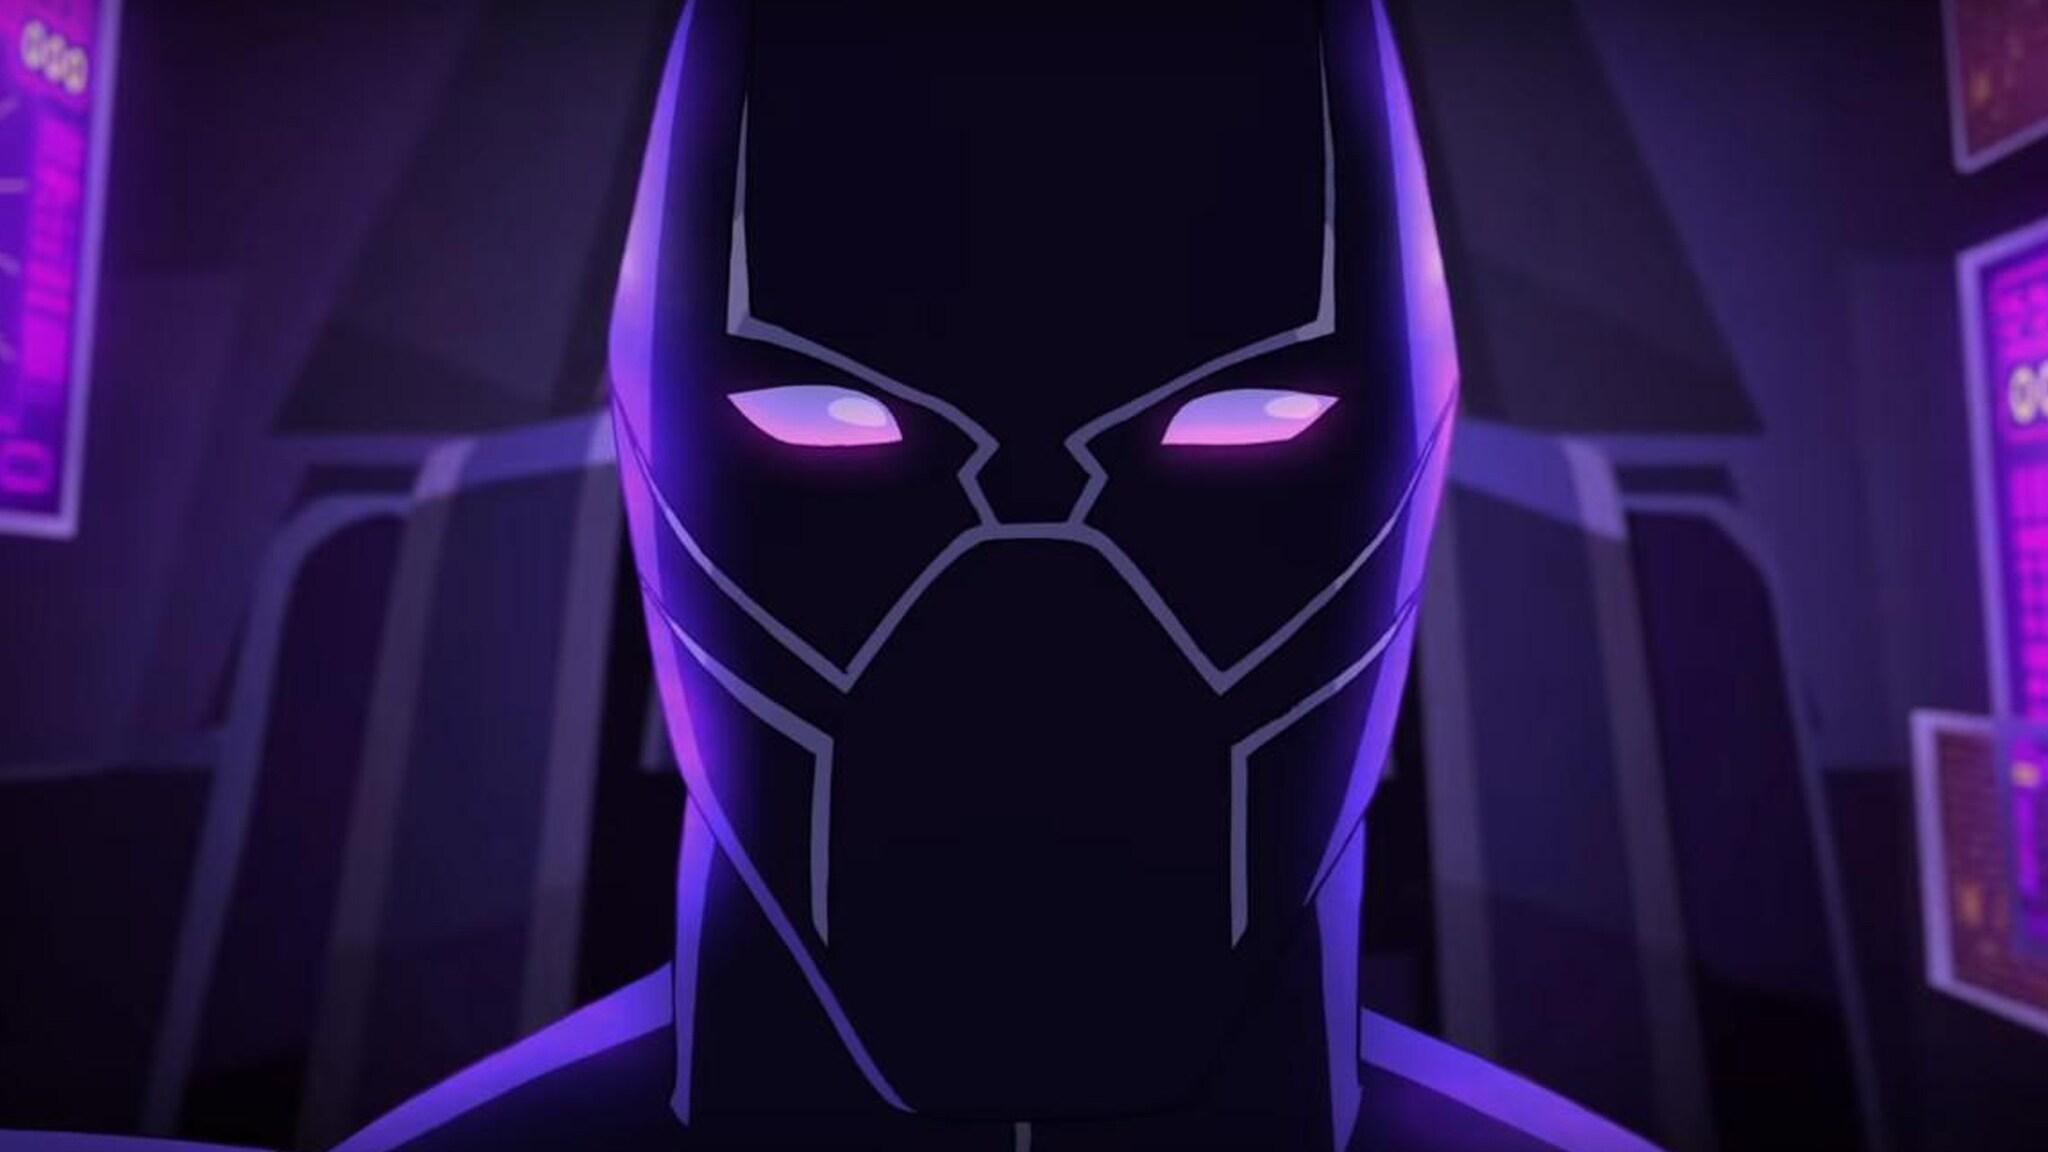 Rai Gulp Avengers Black Panther (v) - Ep. 113